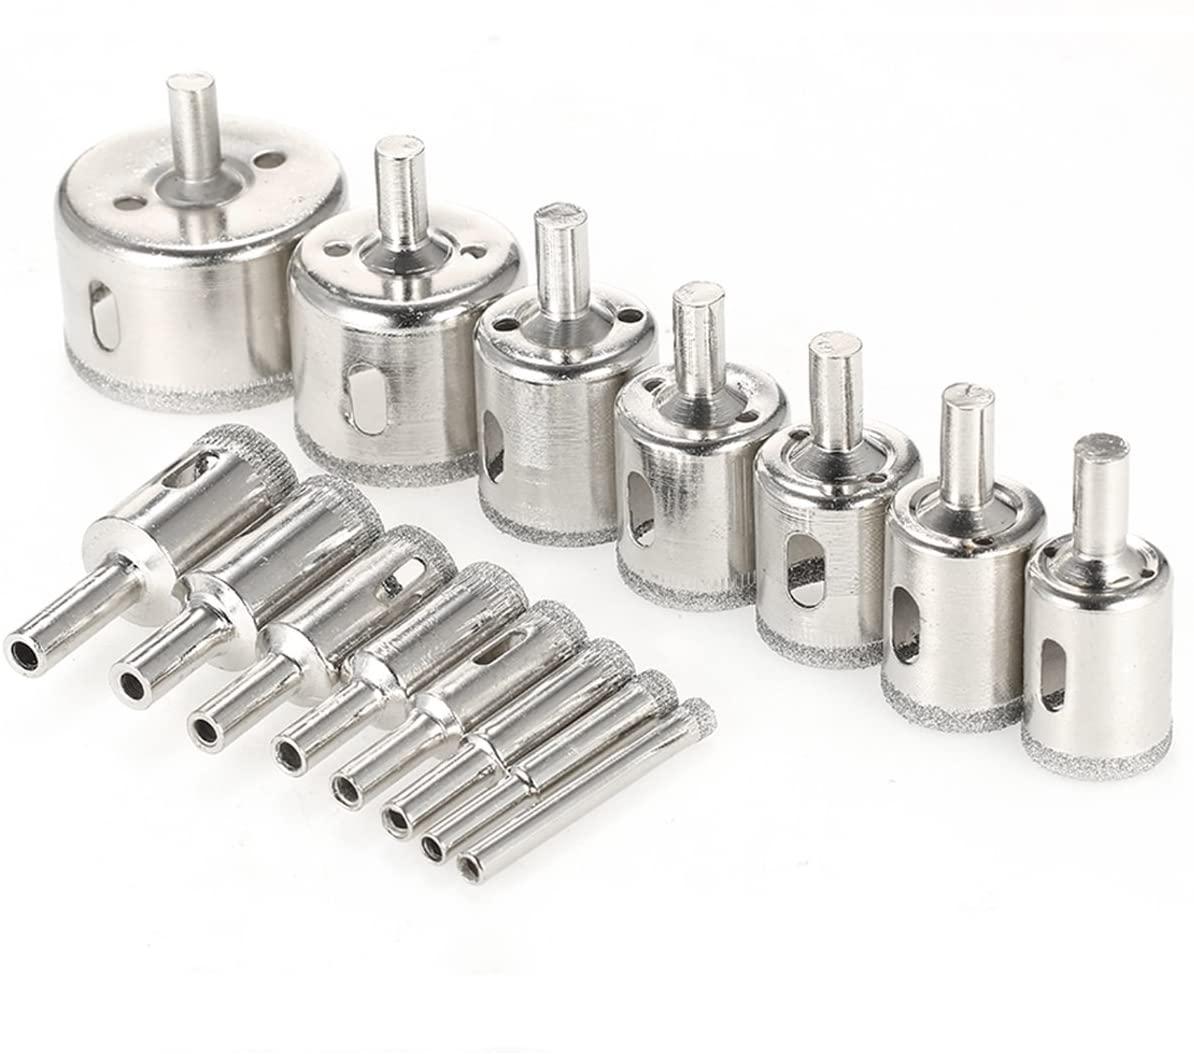 15 PCS Electroplated Diamond Core Drill Bit Set for Ceramic, Glass, Porcelain Tile